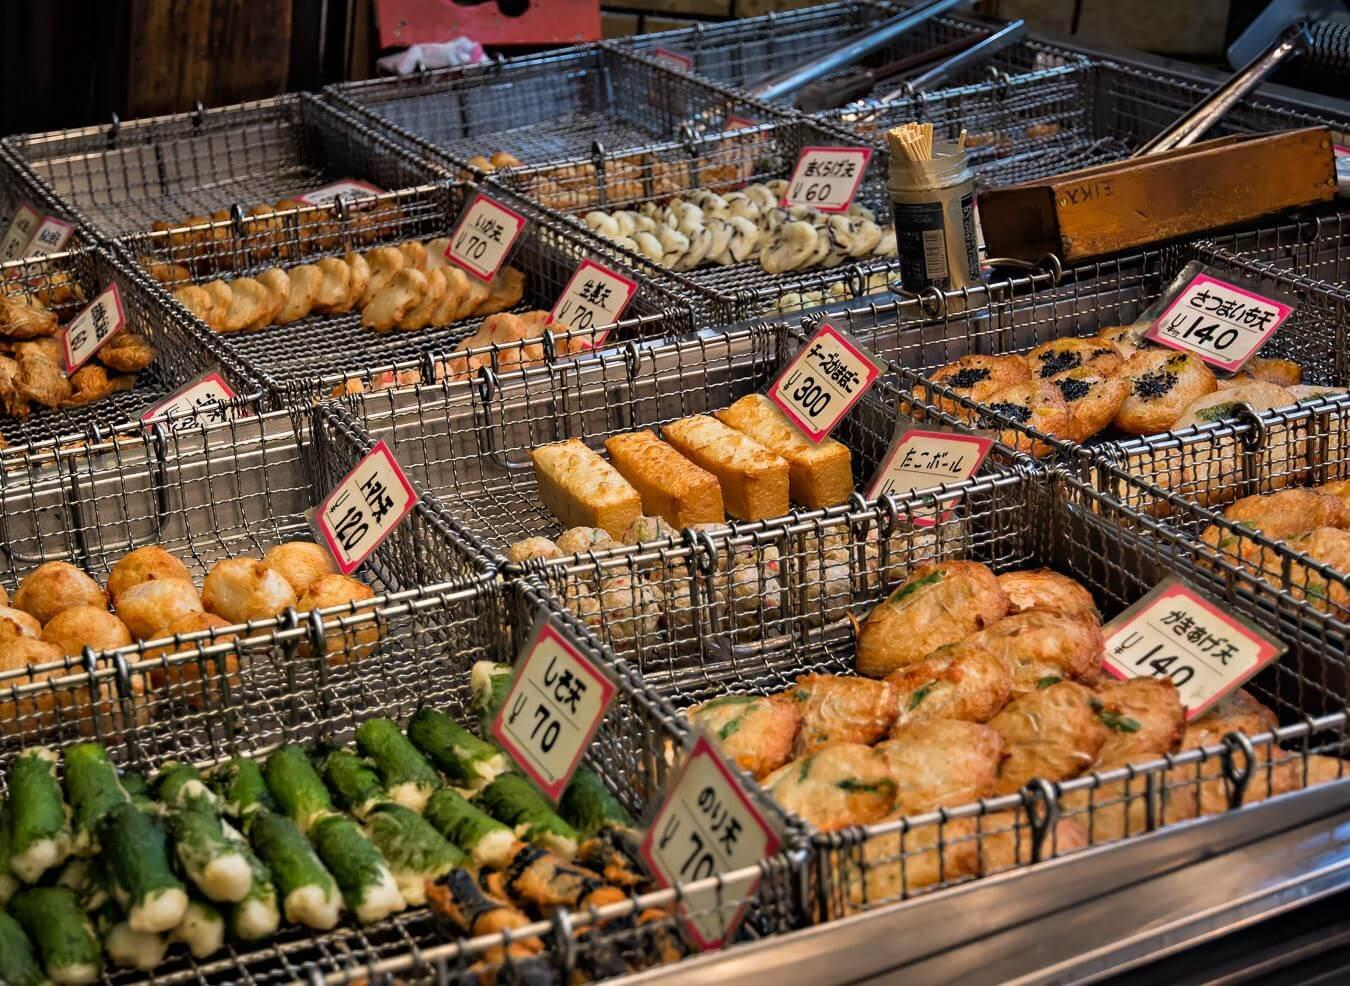 Street food in Osaka, Japan - Photo by Zdenek Sindelar of CuriousZed Photography